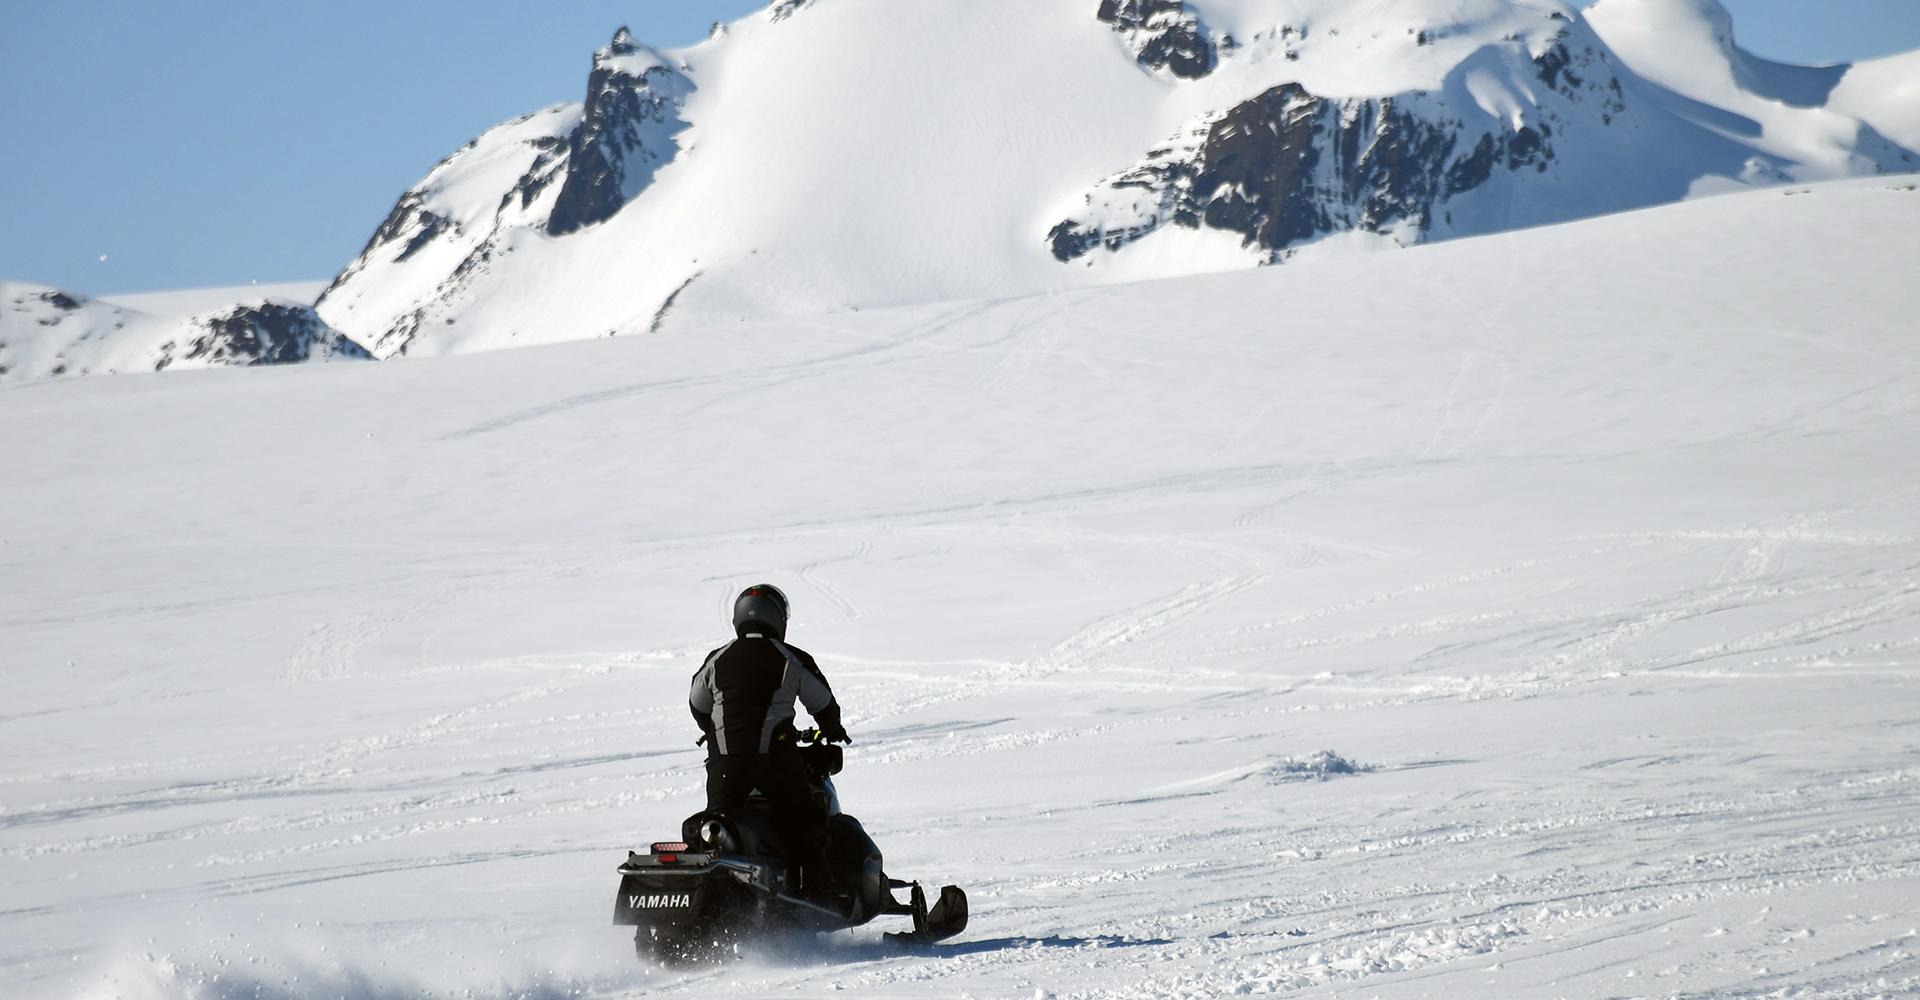 moto de nieve reykjavik Islandia